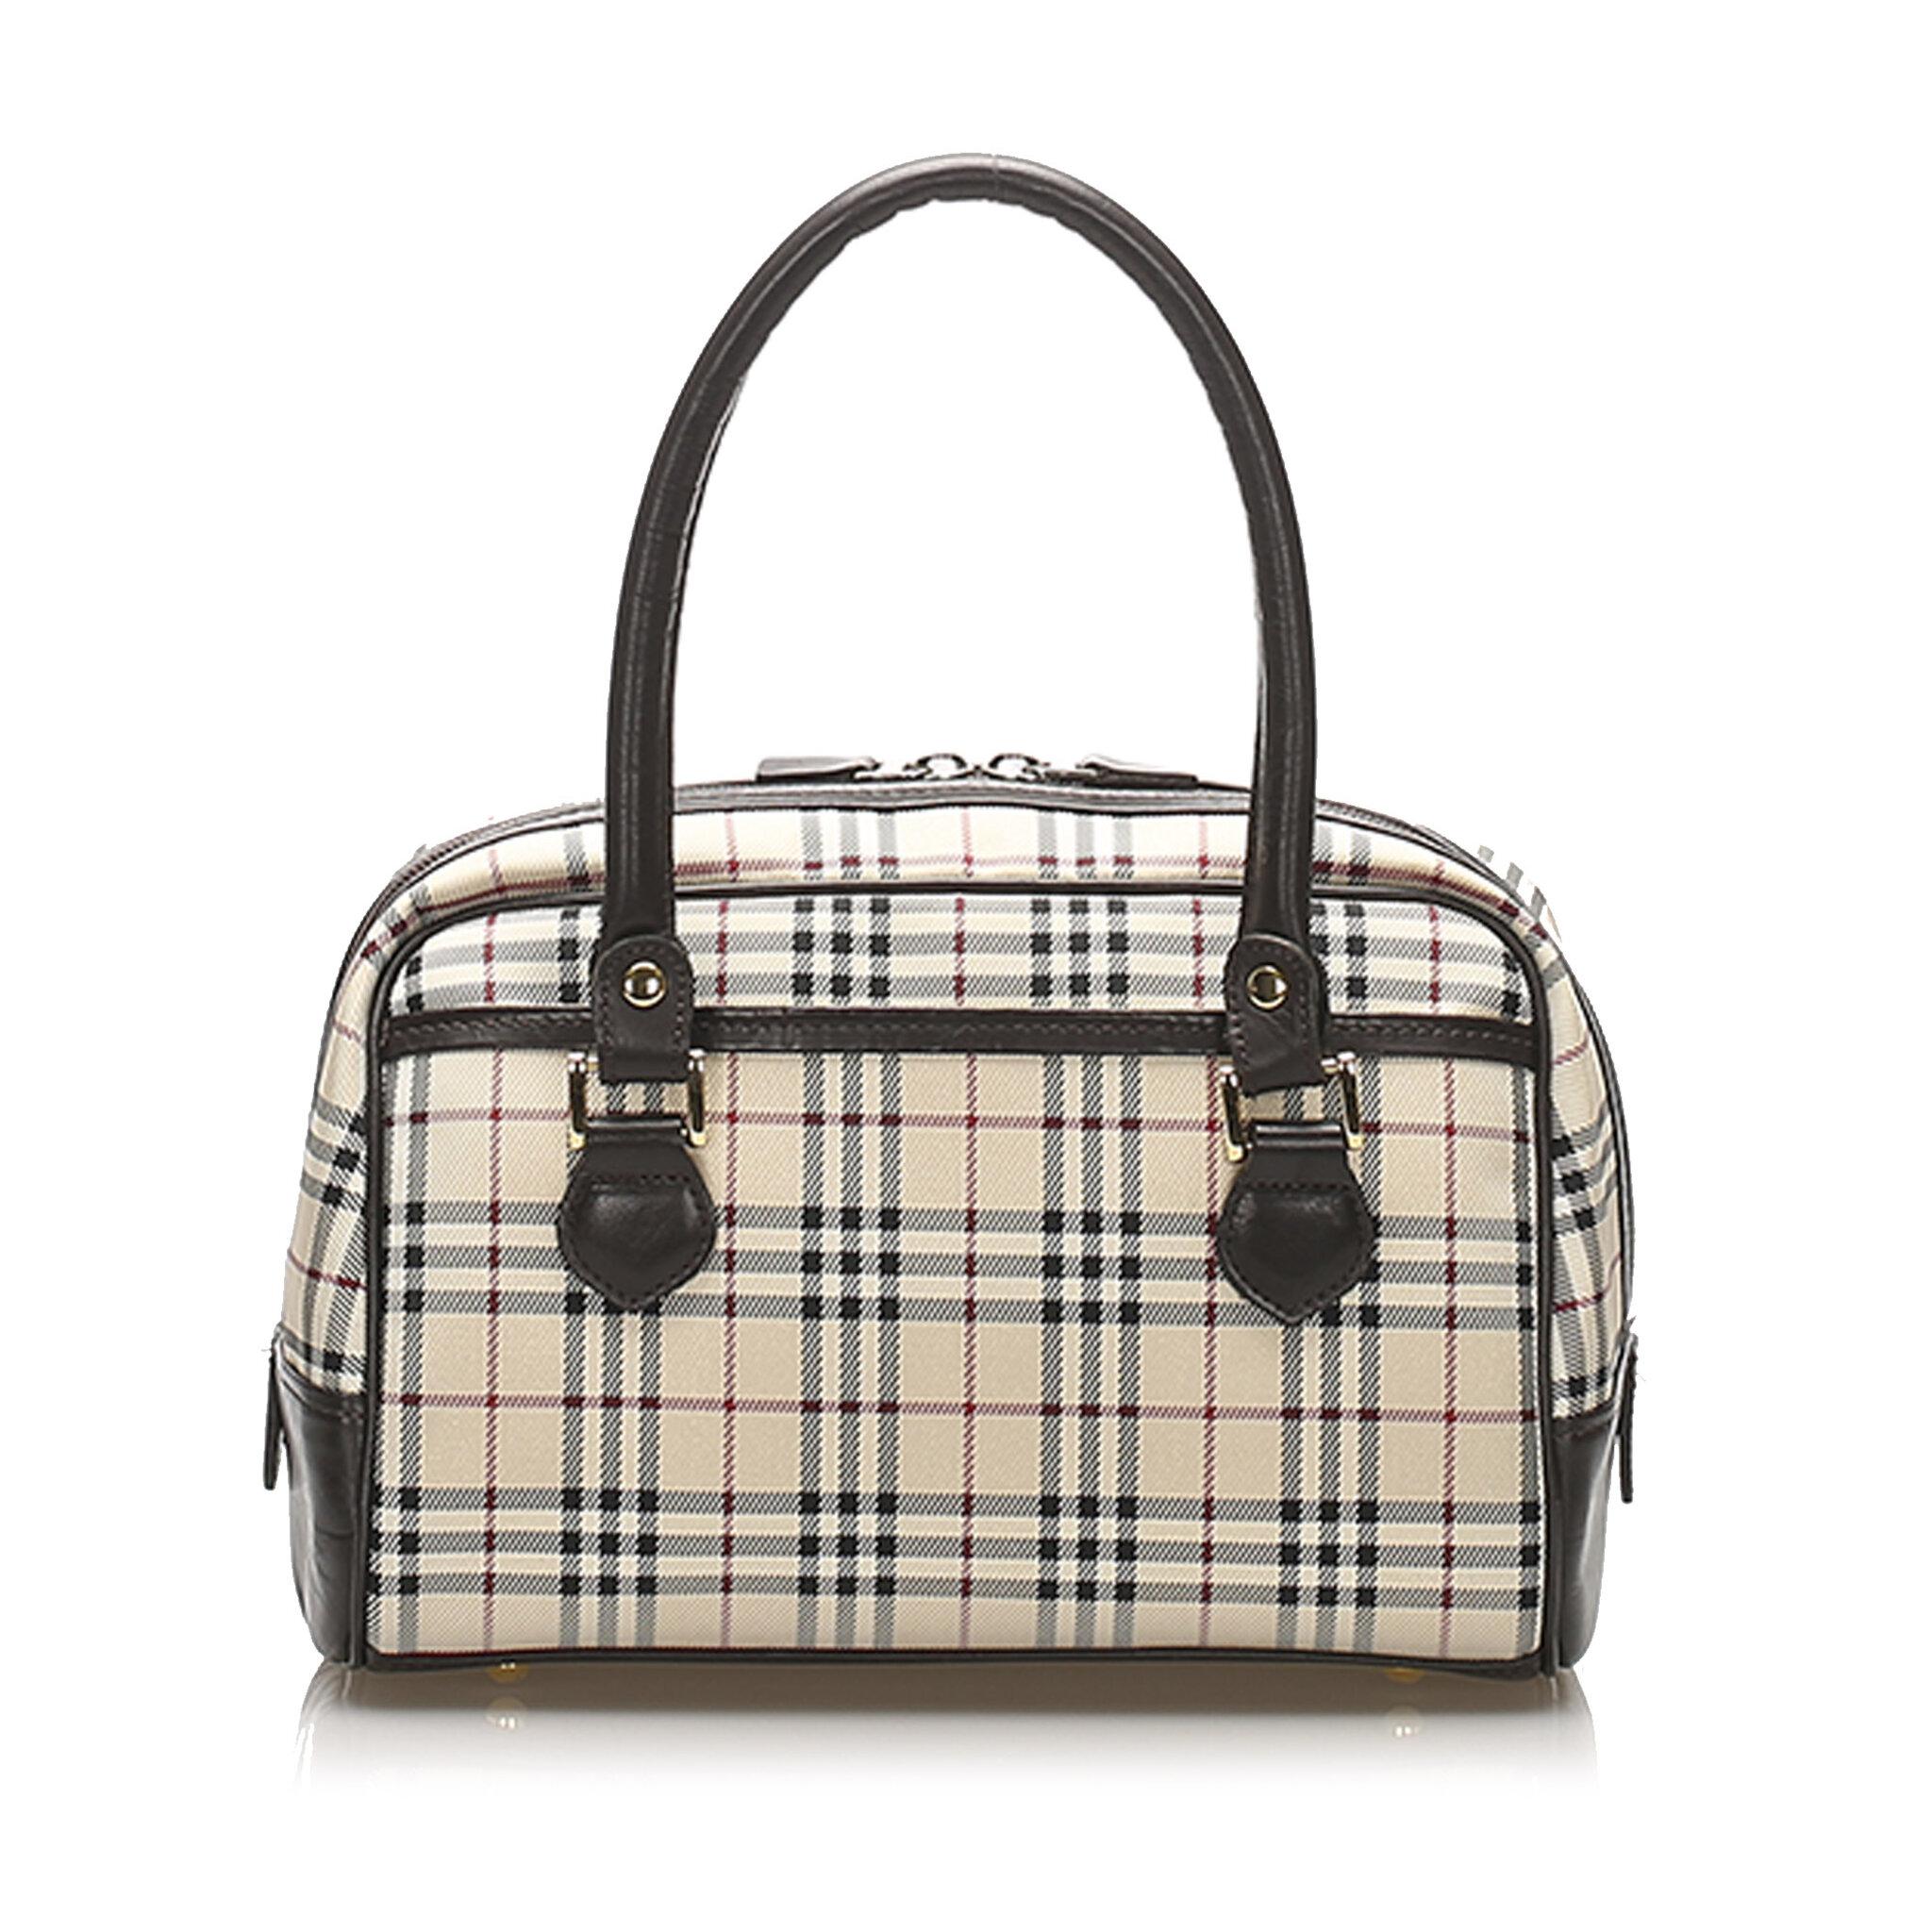 Burberry House Check Nylon Handbag